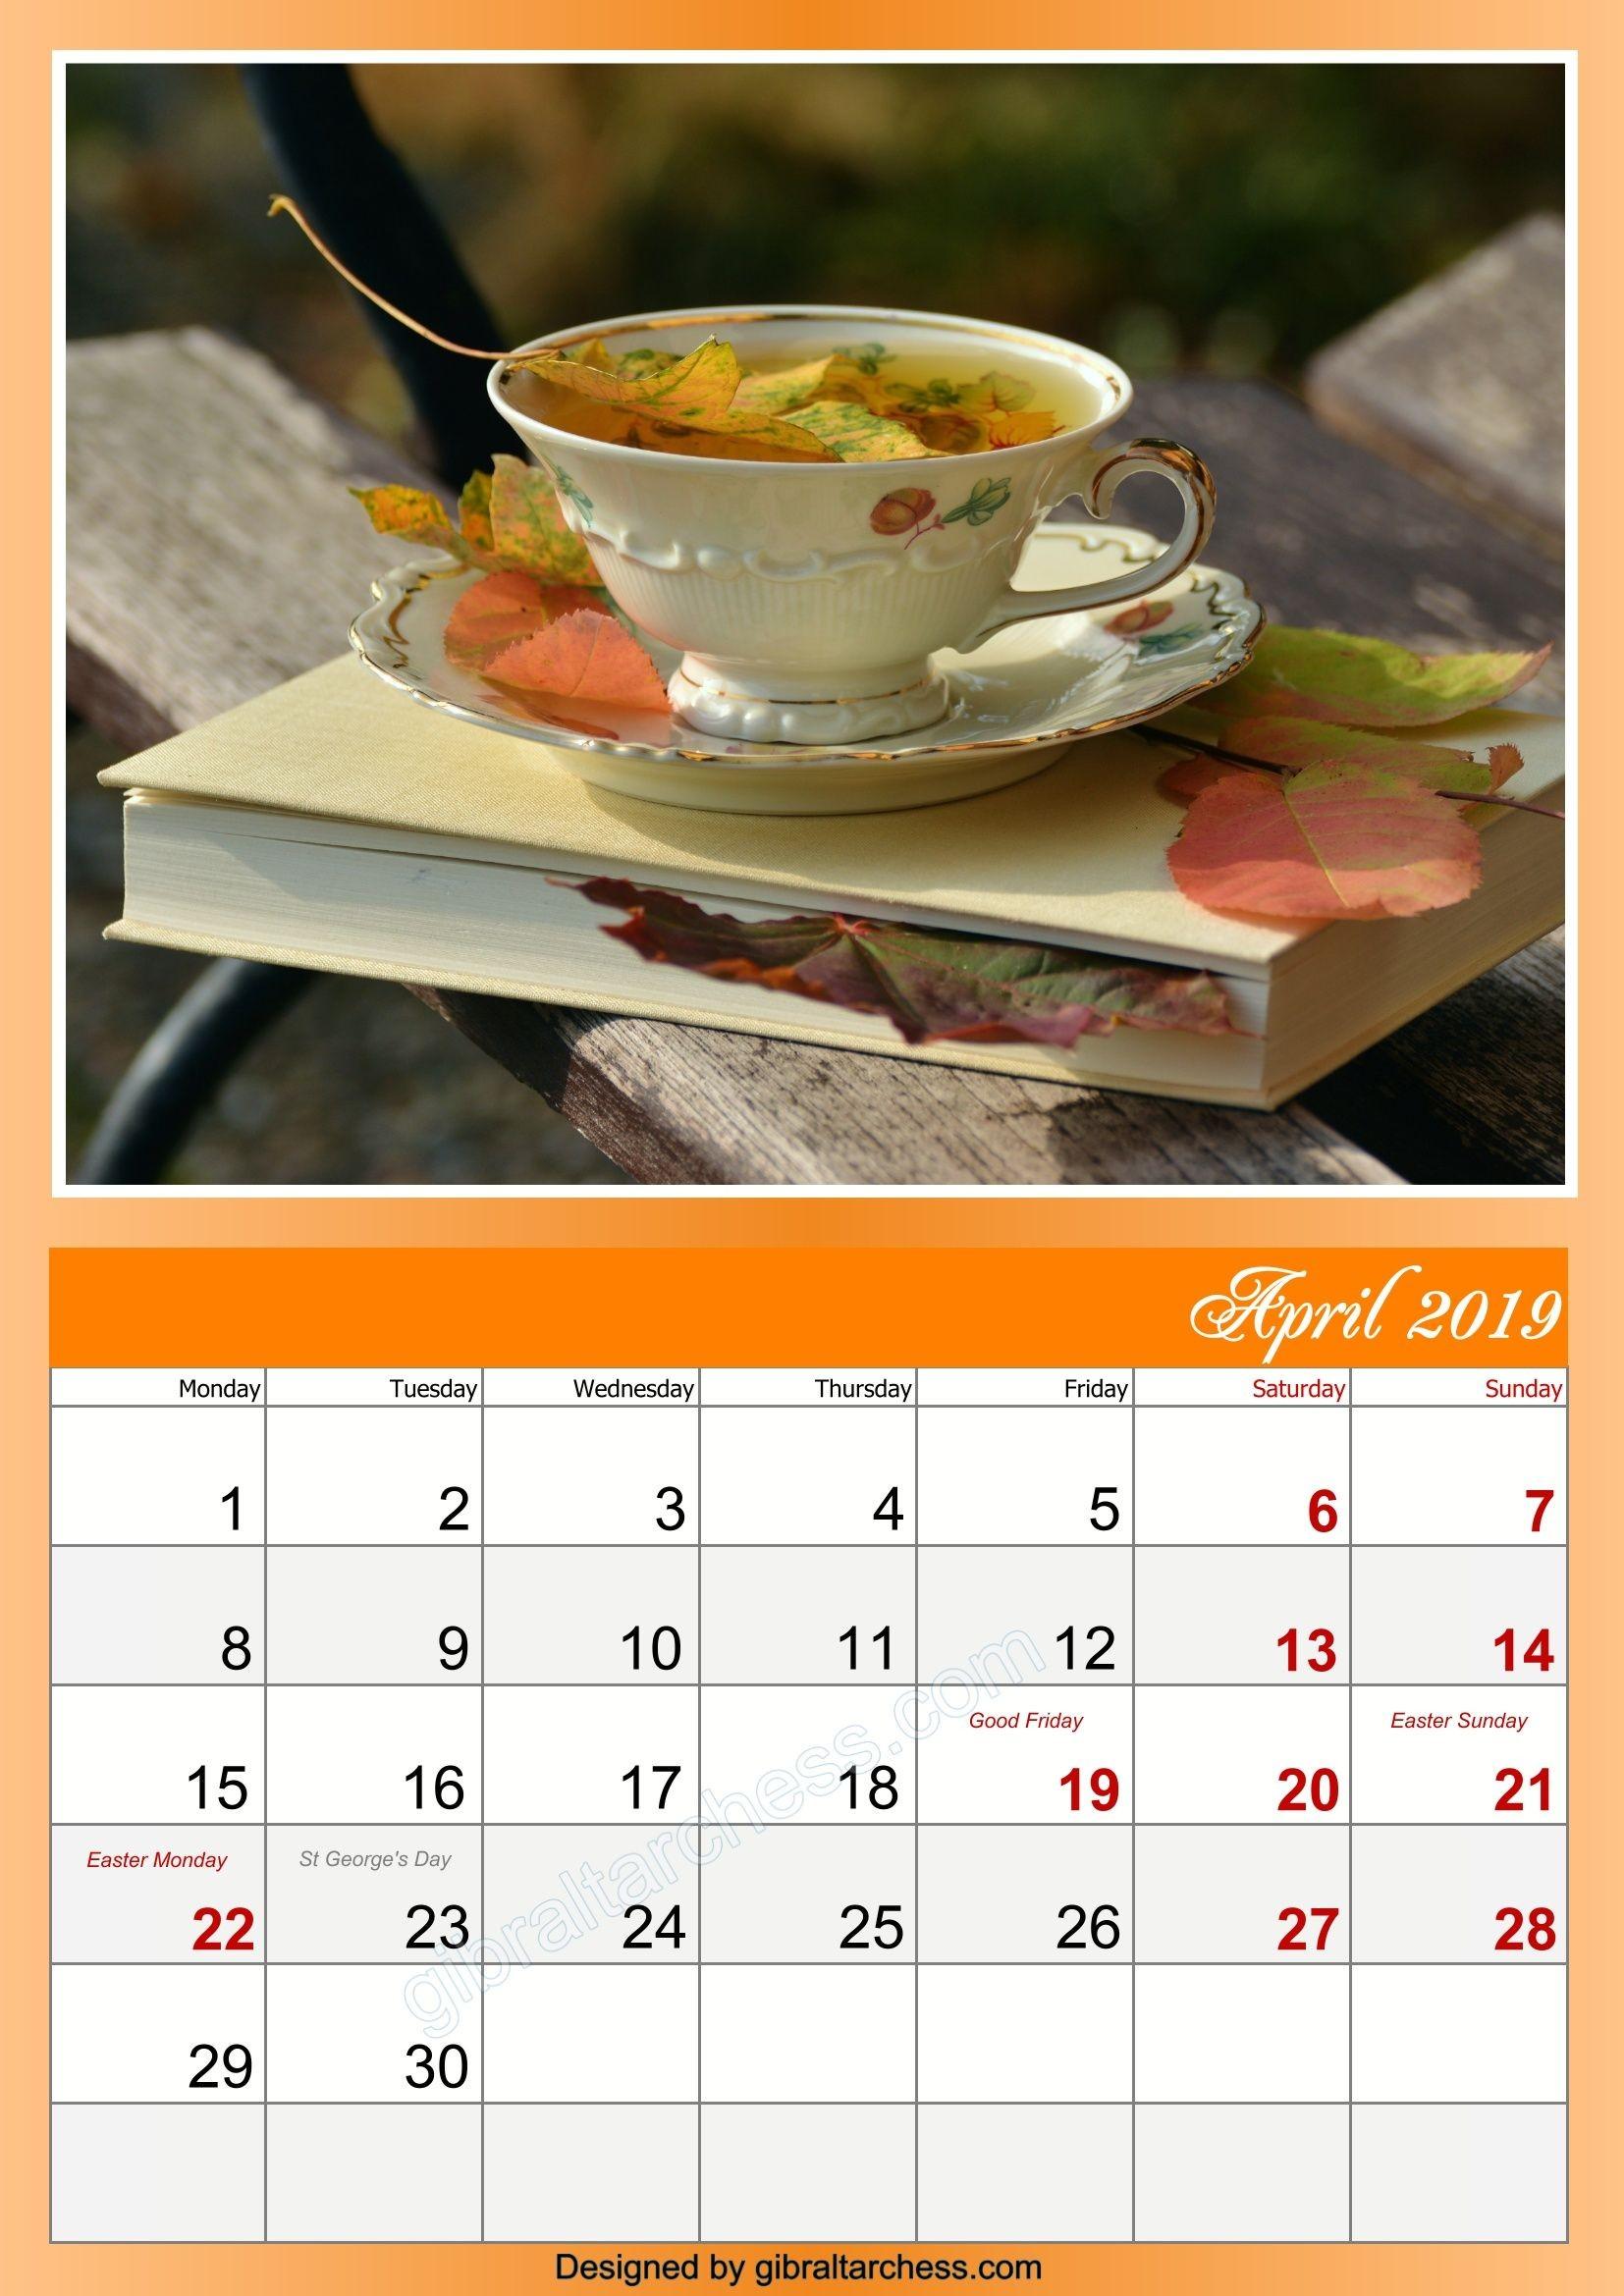 March 2019 Calendar Lala Ramswaroop Más Caliente 2 2019 Wall Yearly Calendar Printable Download Cute Idol Cute Of March 2019 Calendar Lala Ramswaroop Más Recientemente Liberado Media to Get Lala Ramswaroop Calendar 2019 Pdf Download Calendar